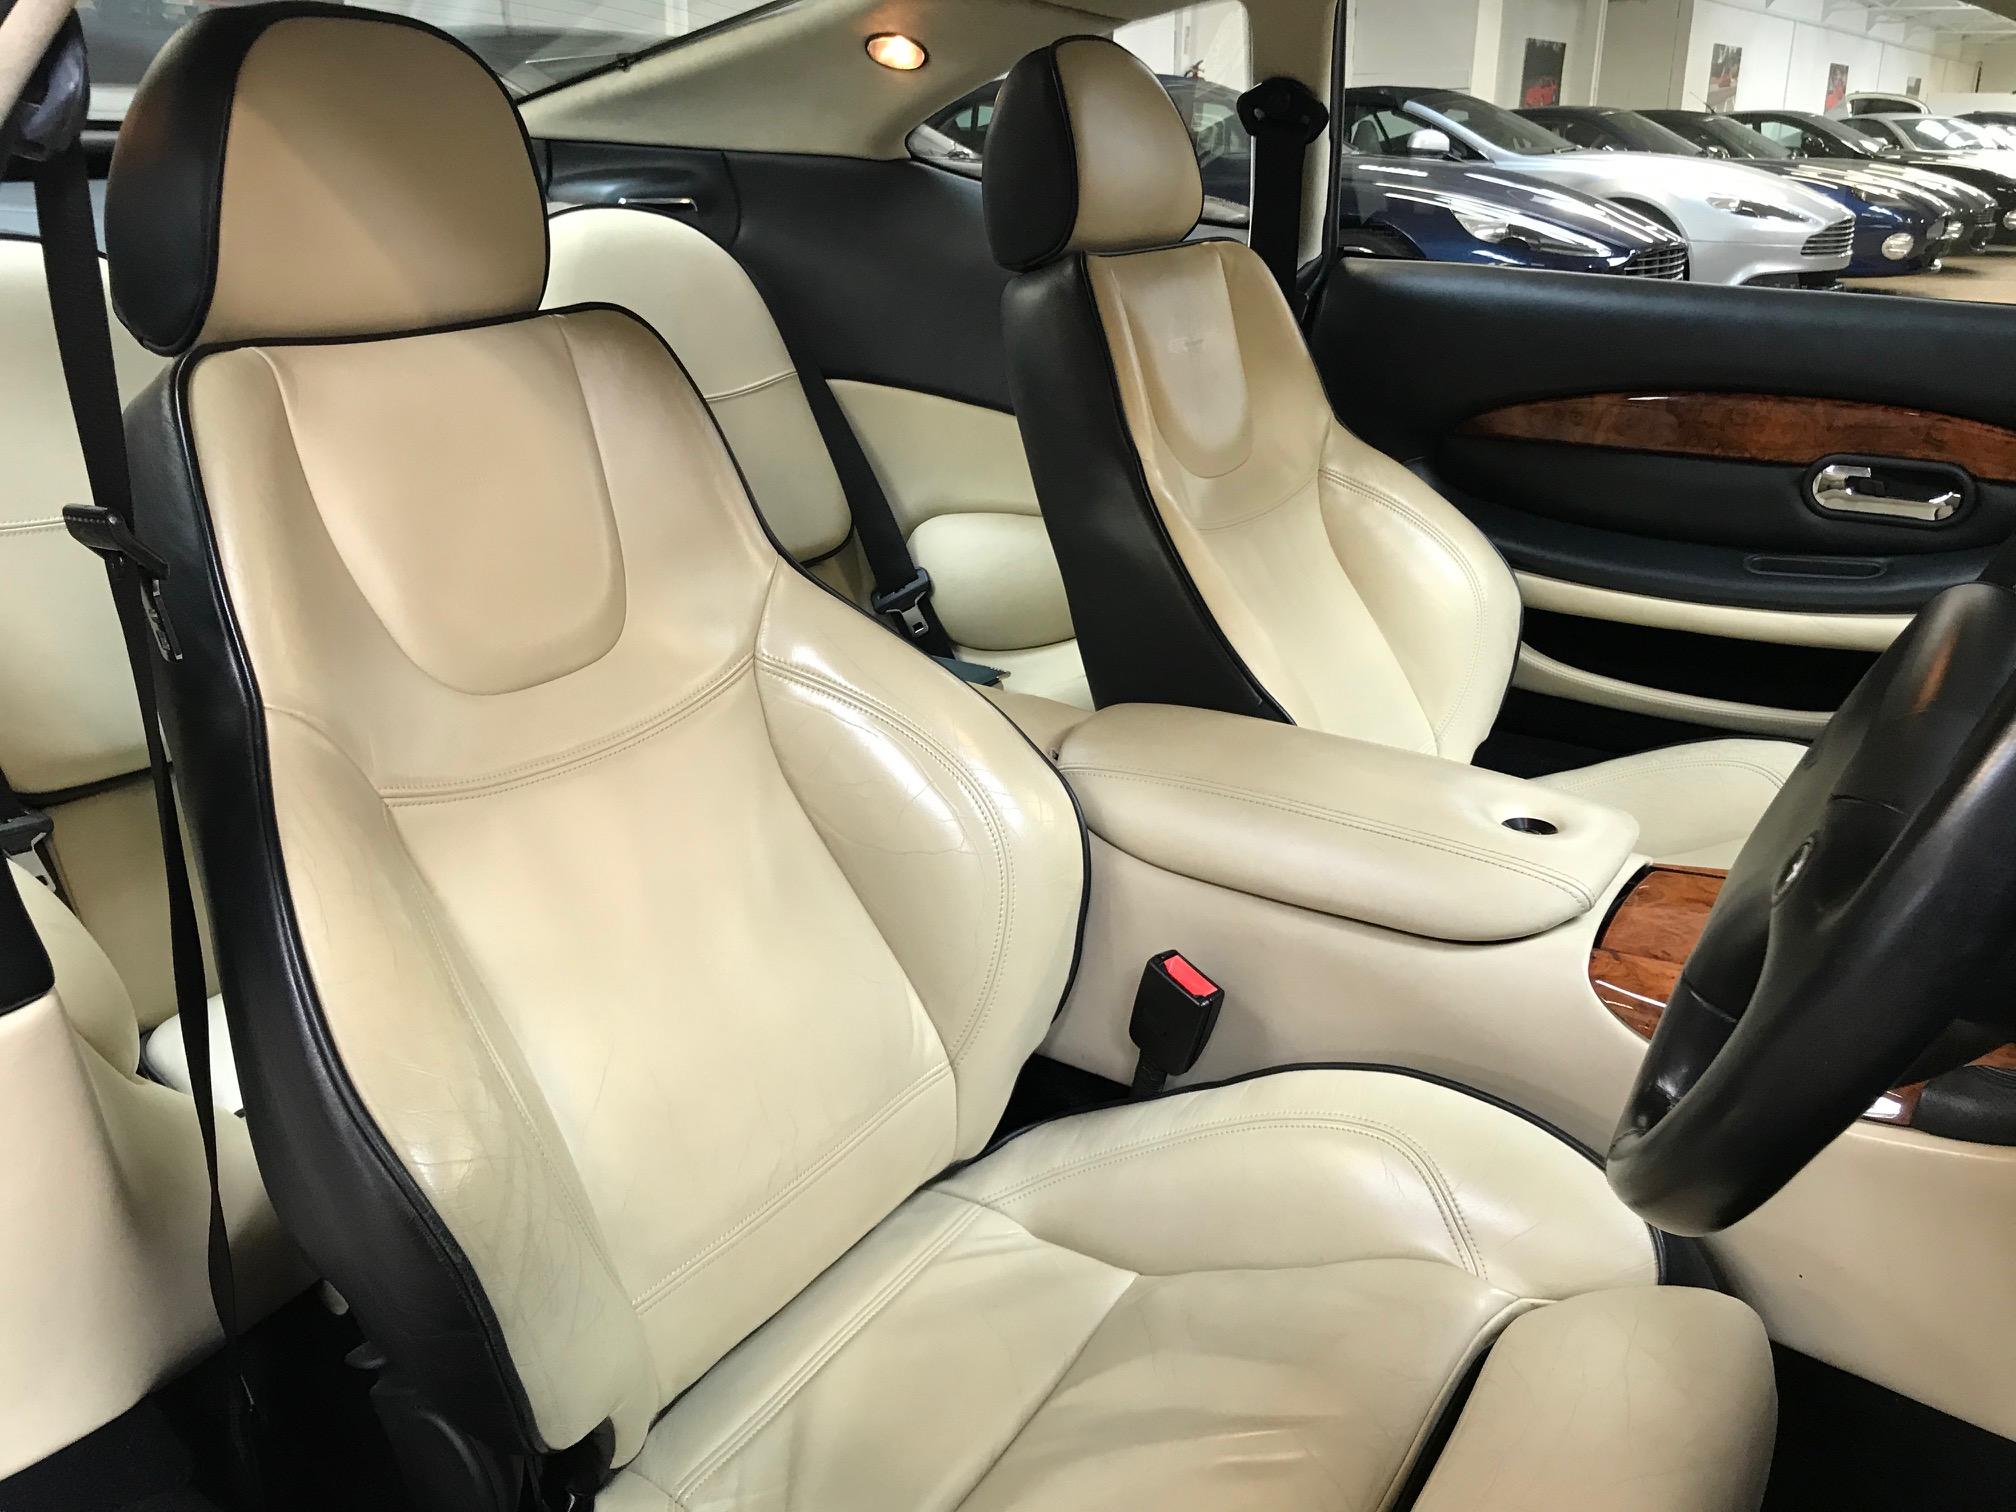 Used Aston Martin DB7 Vantage for sale